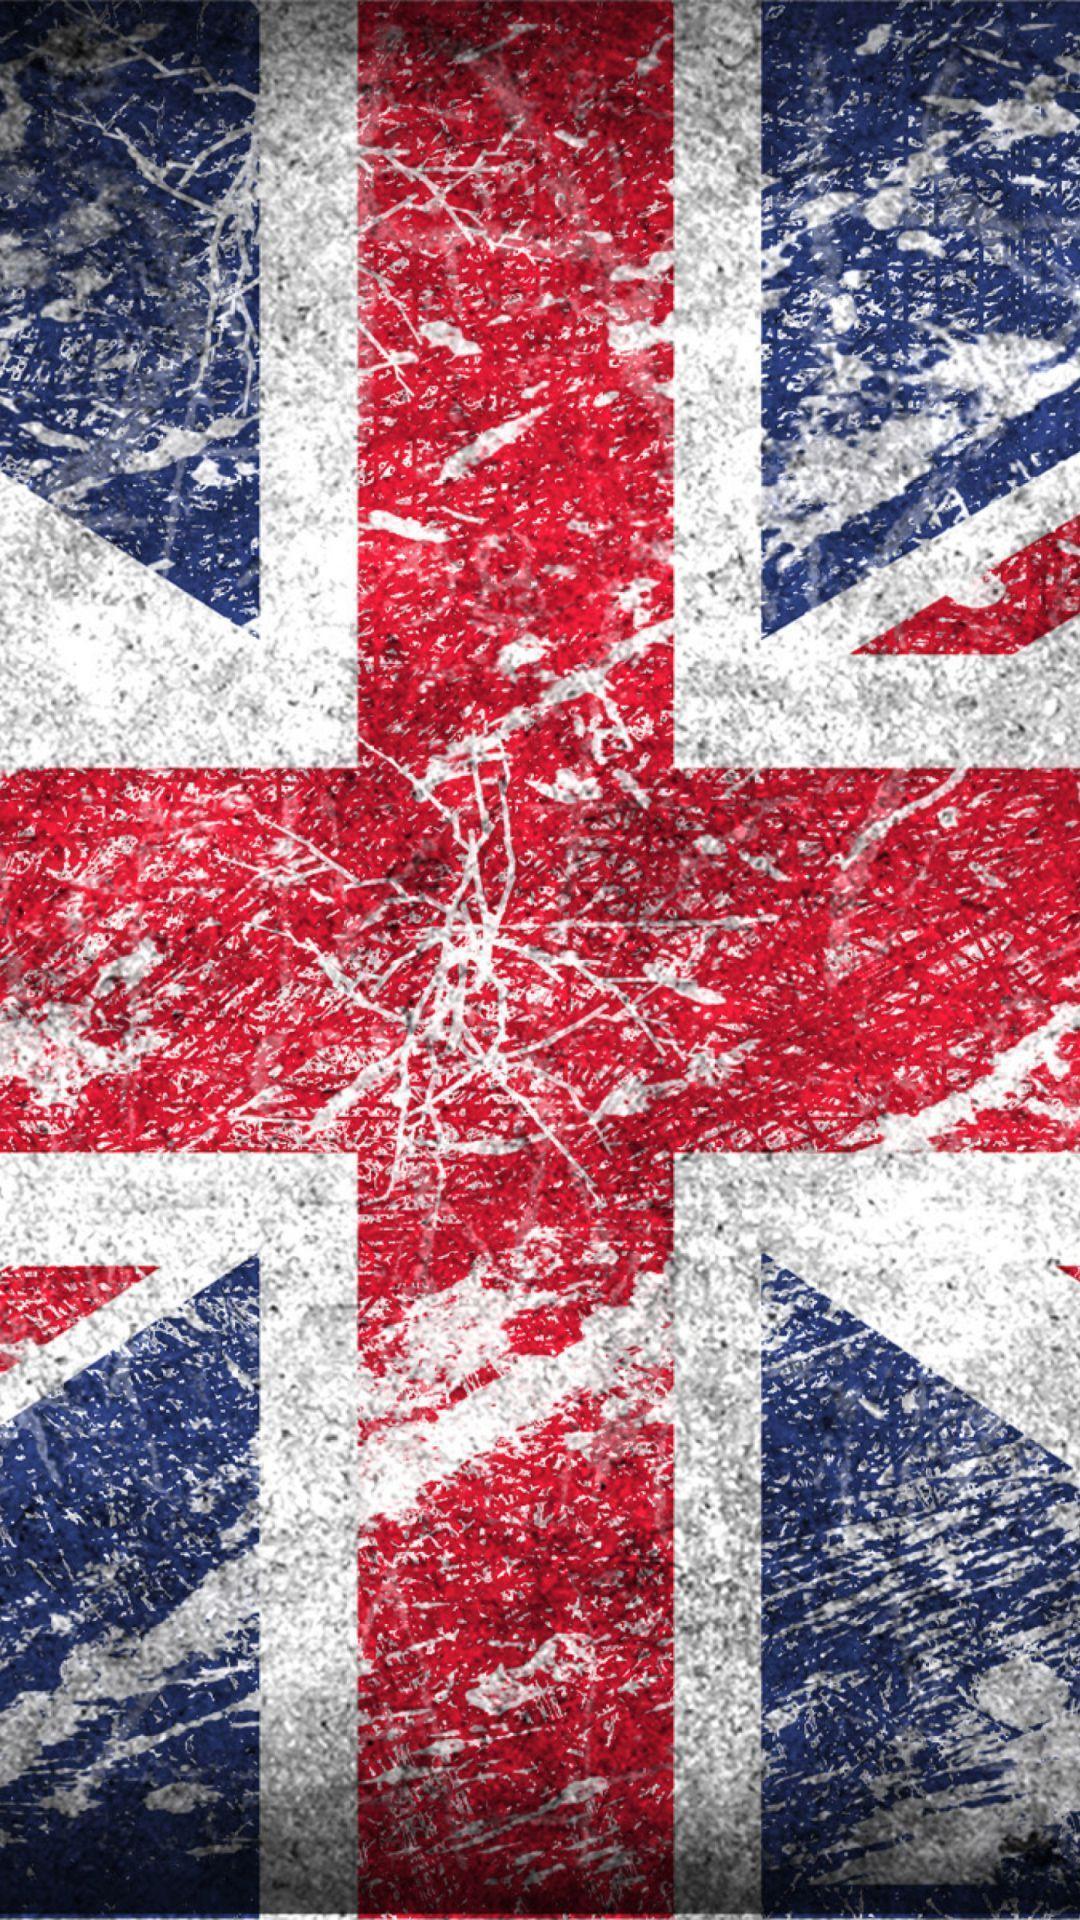 Union Jack Iphone Wallpaper British Union Jack Flag Wallpapers Wallpaper Cave